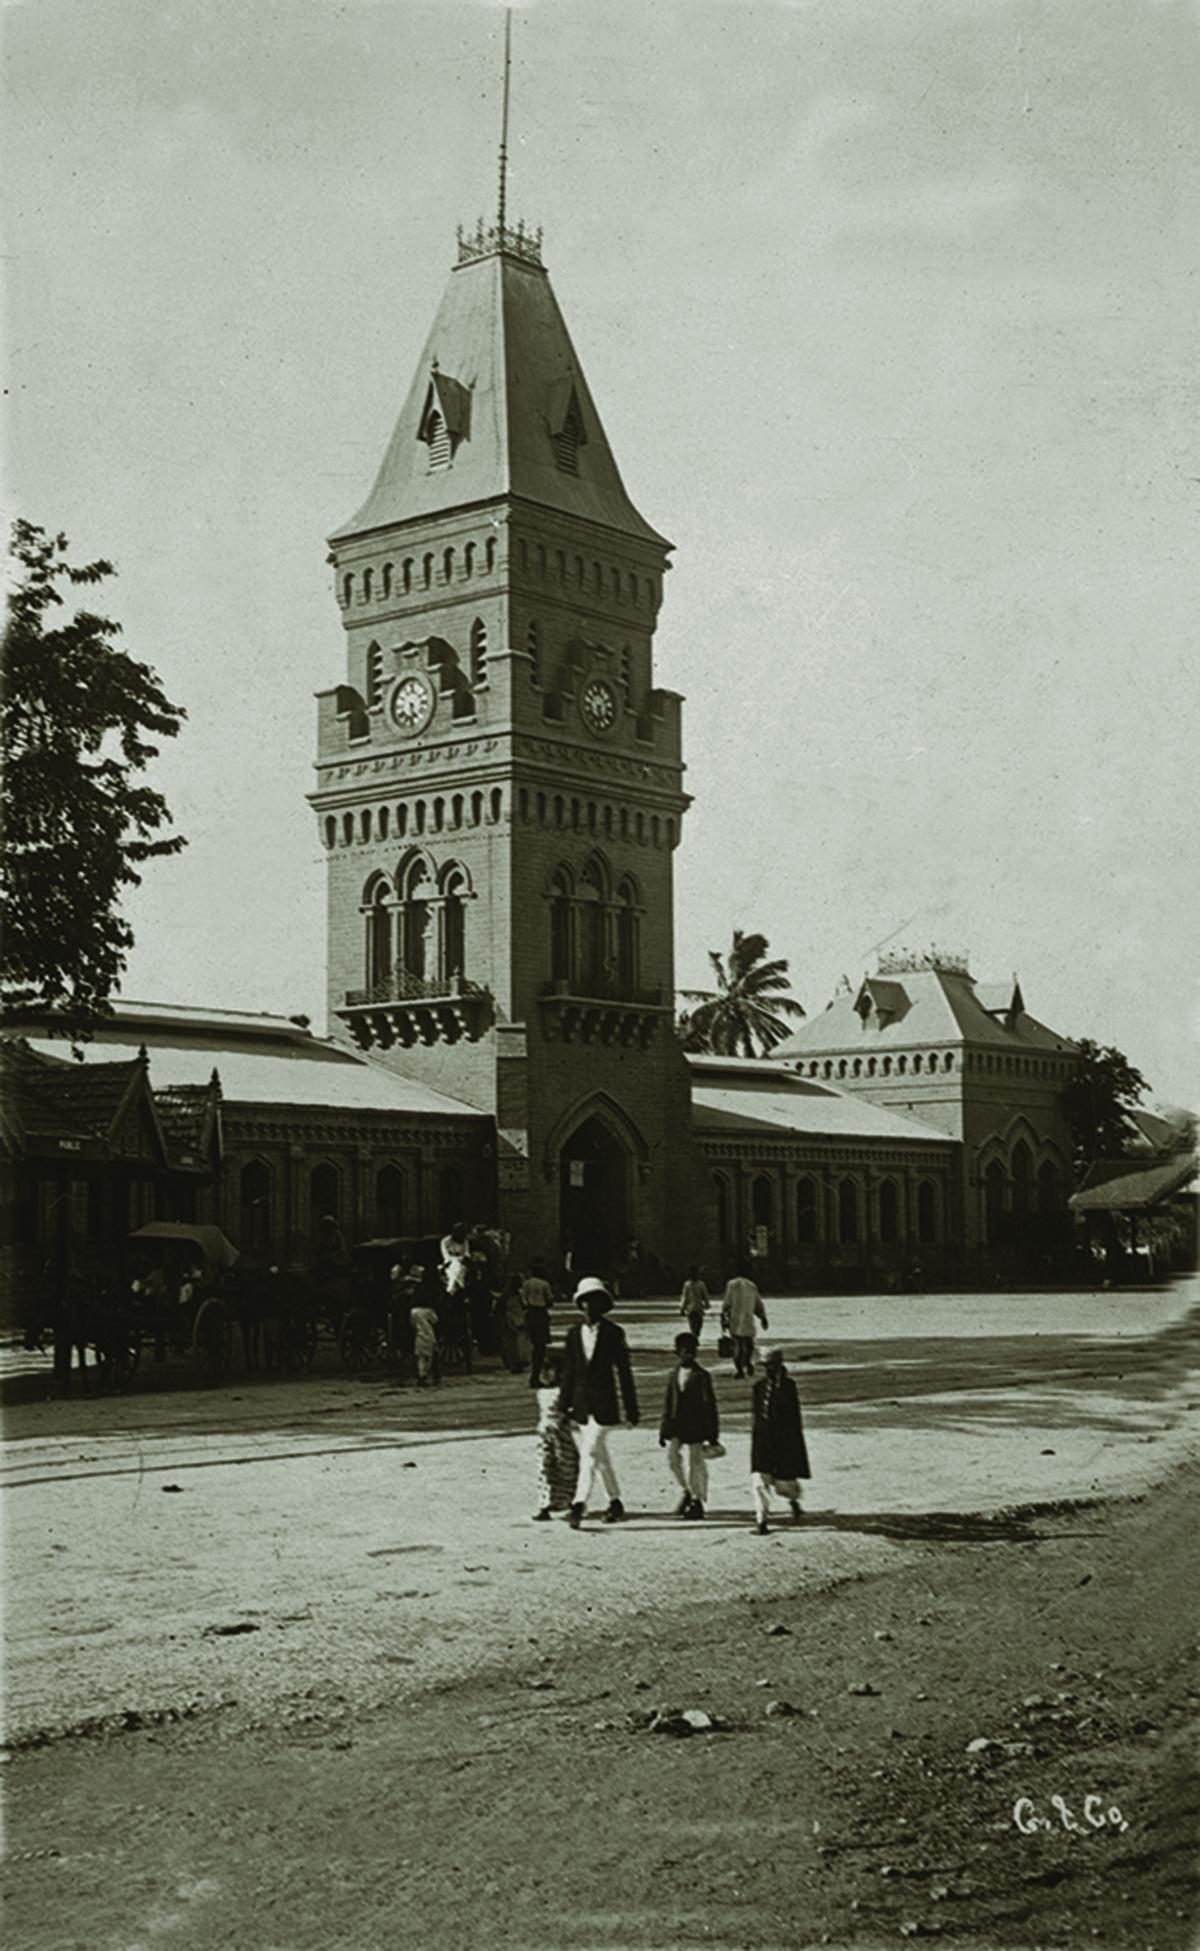 Empress Market